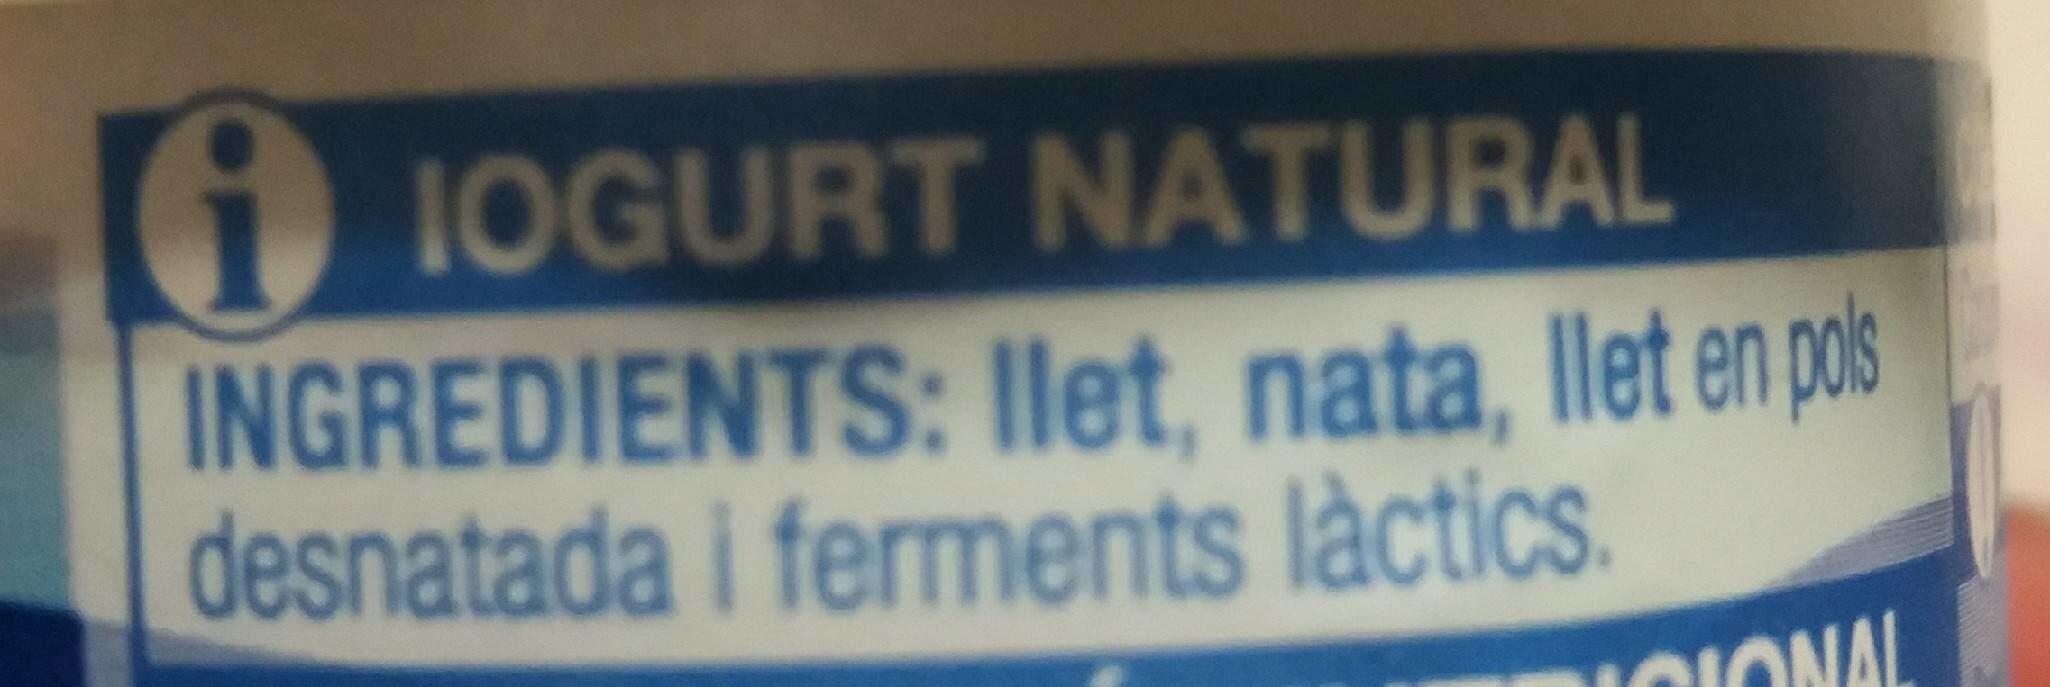 Iogurt grec natural - Ingrediënten - ca